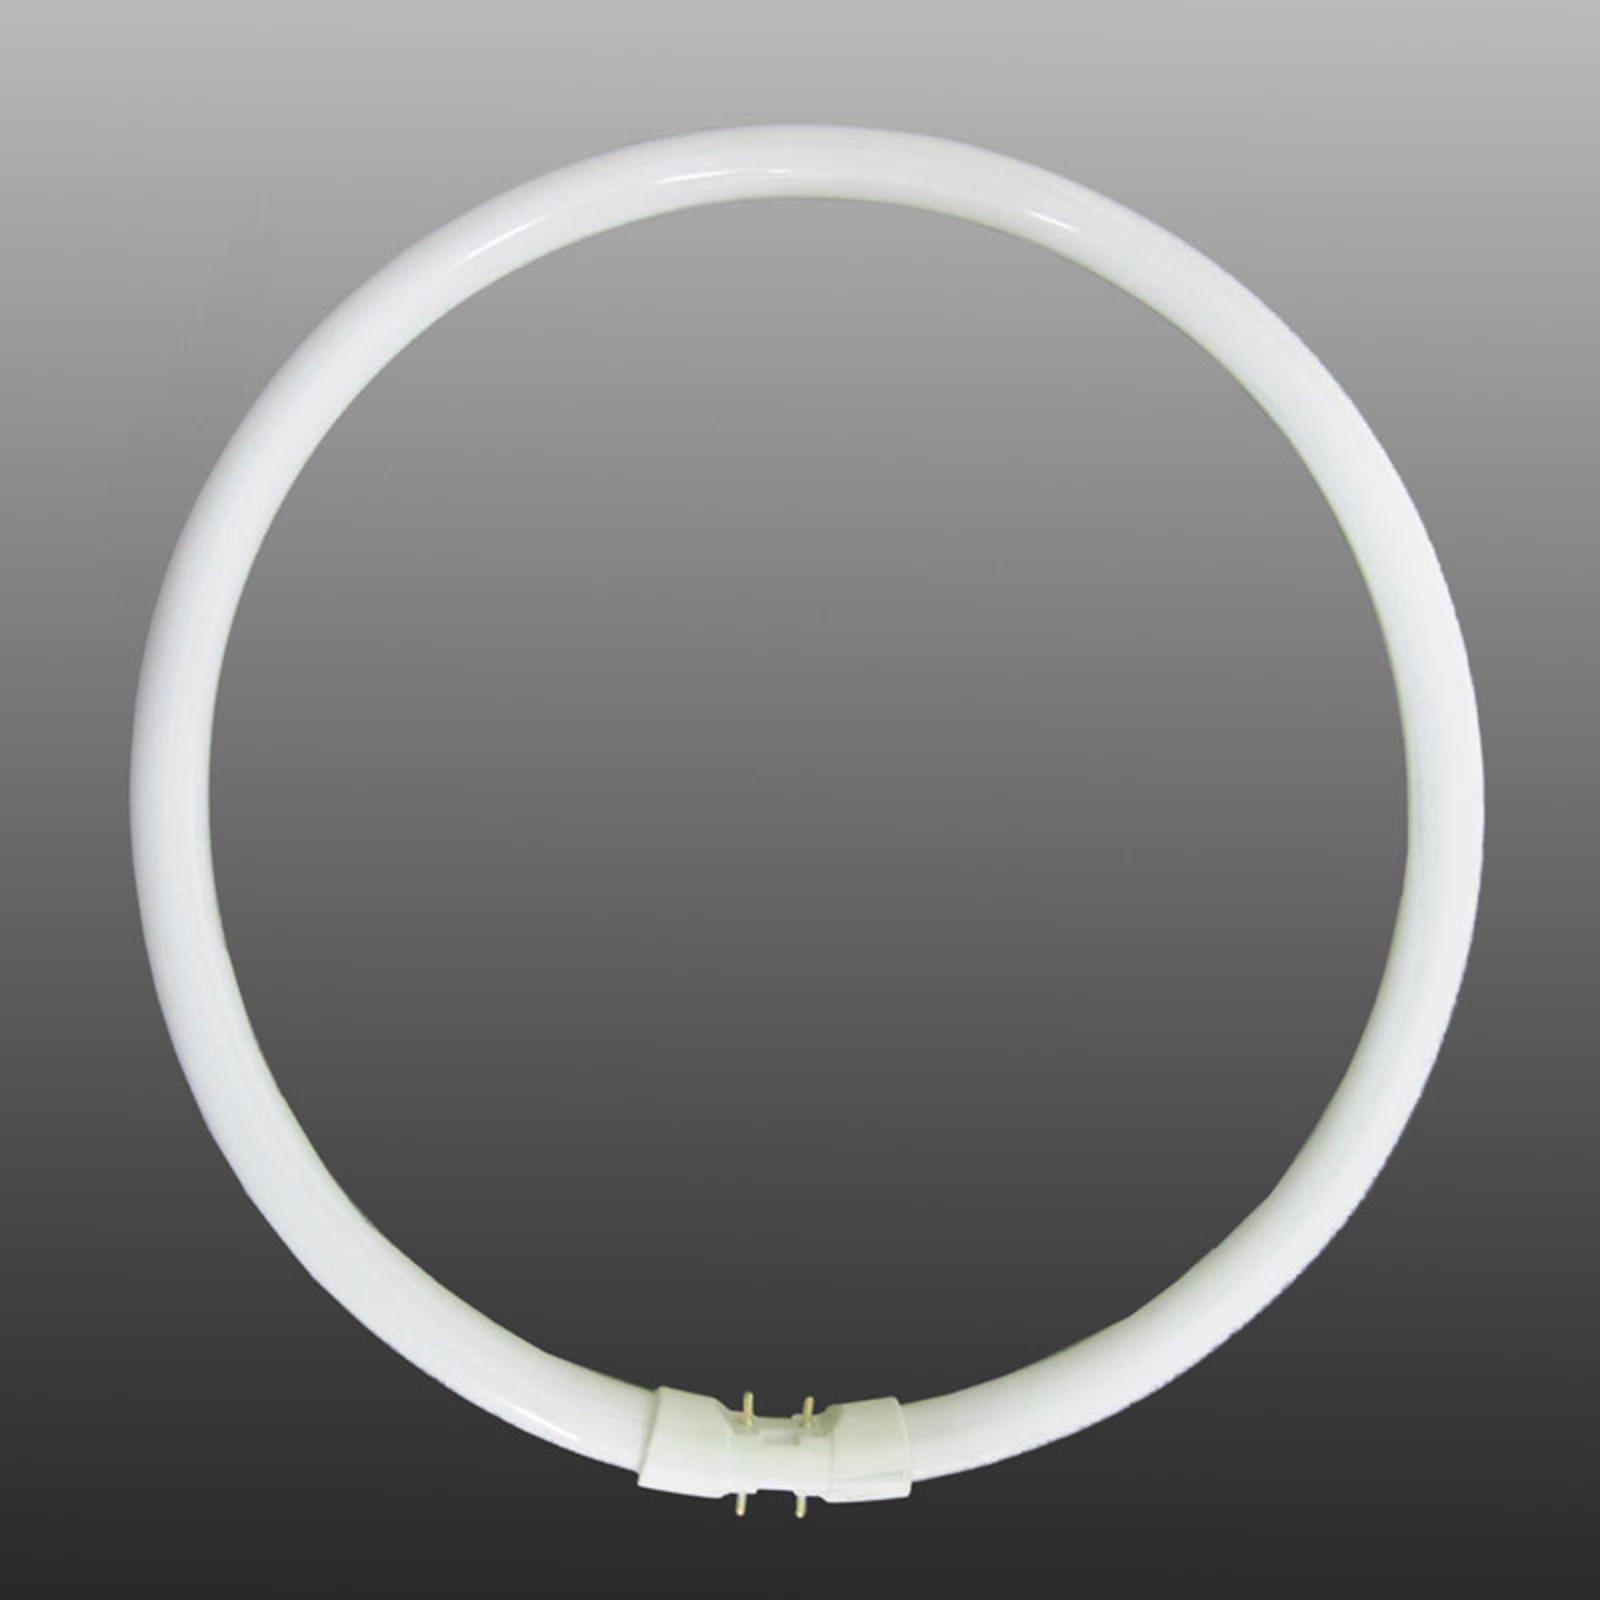 2GX13 T5 22W ringformet lysstoffrør, varmhvit